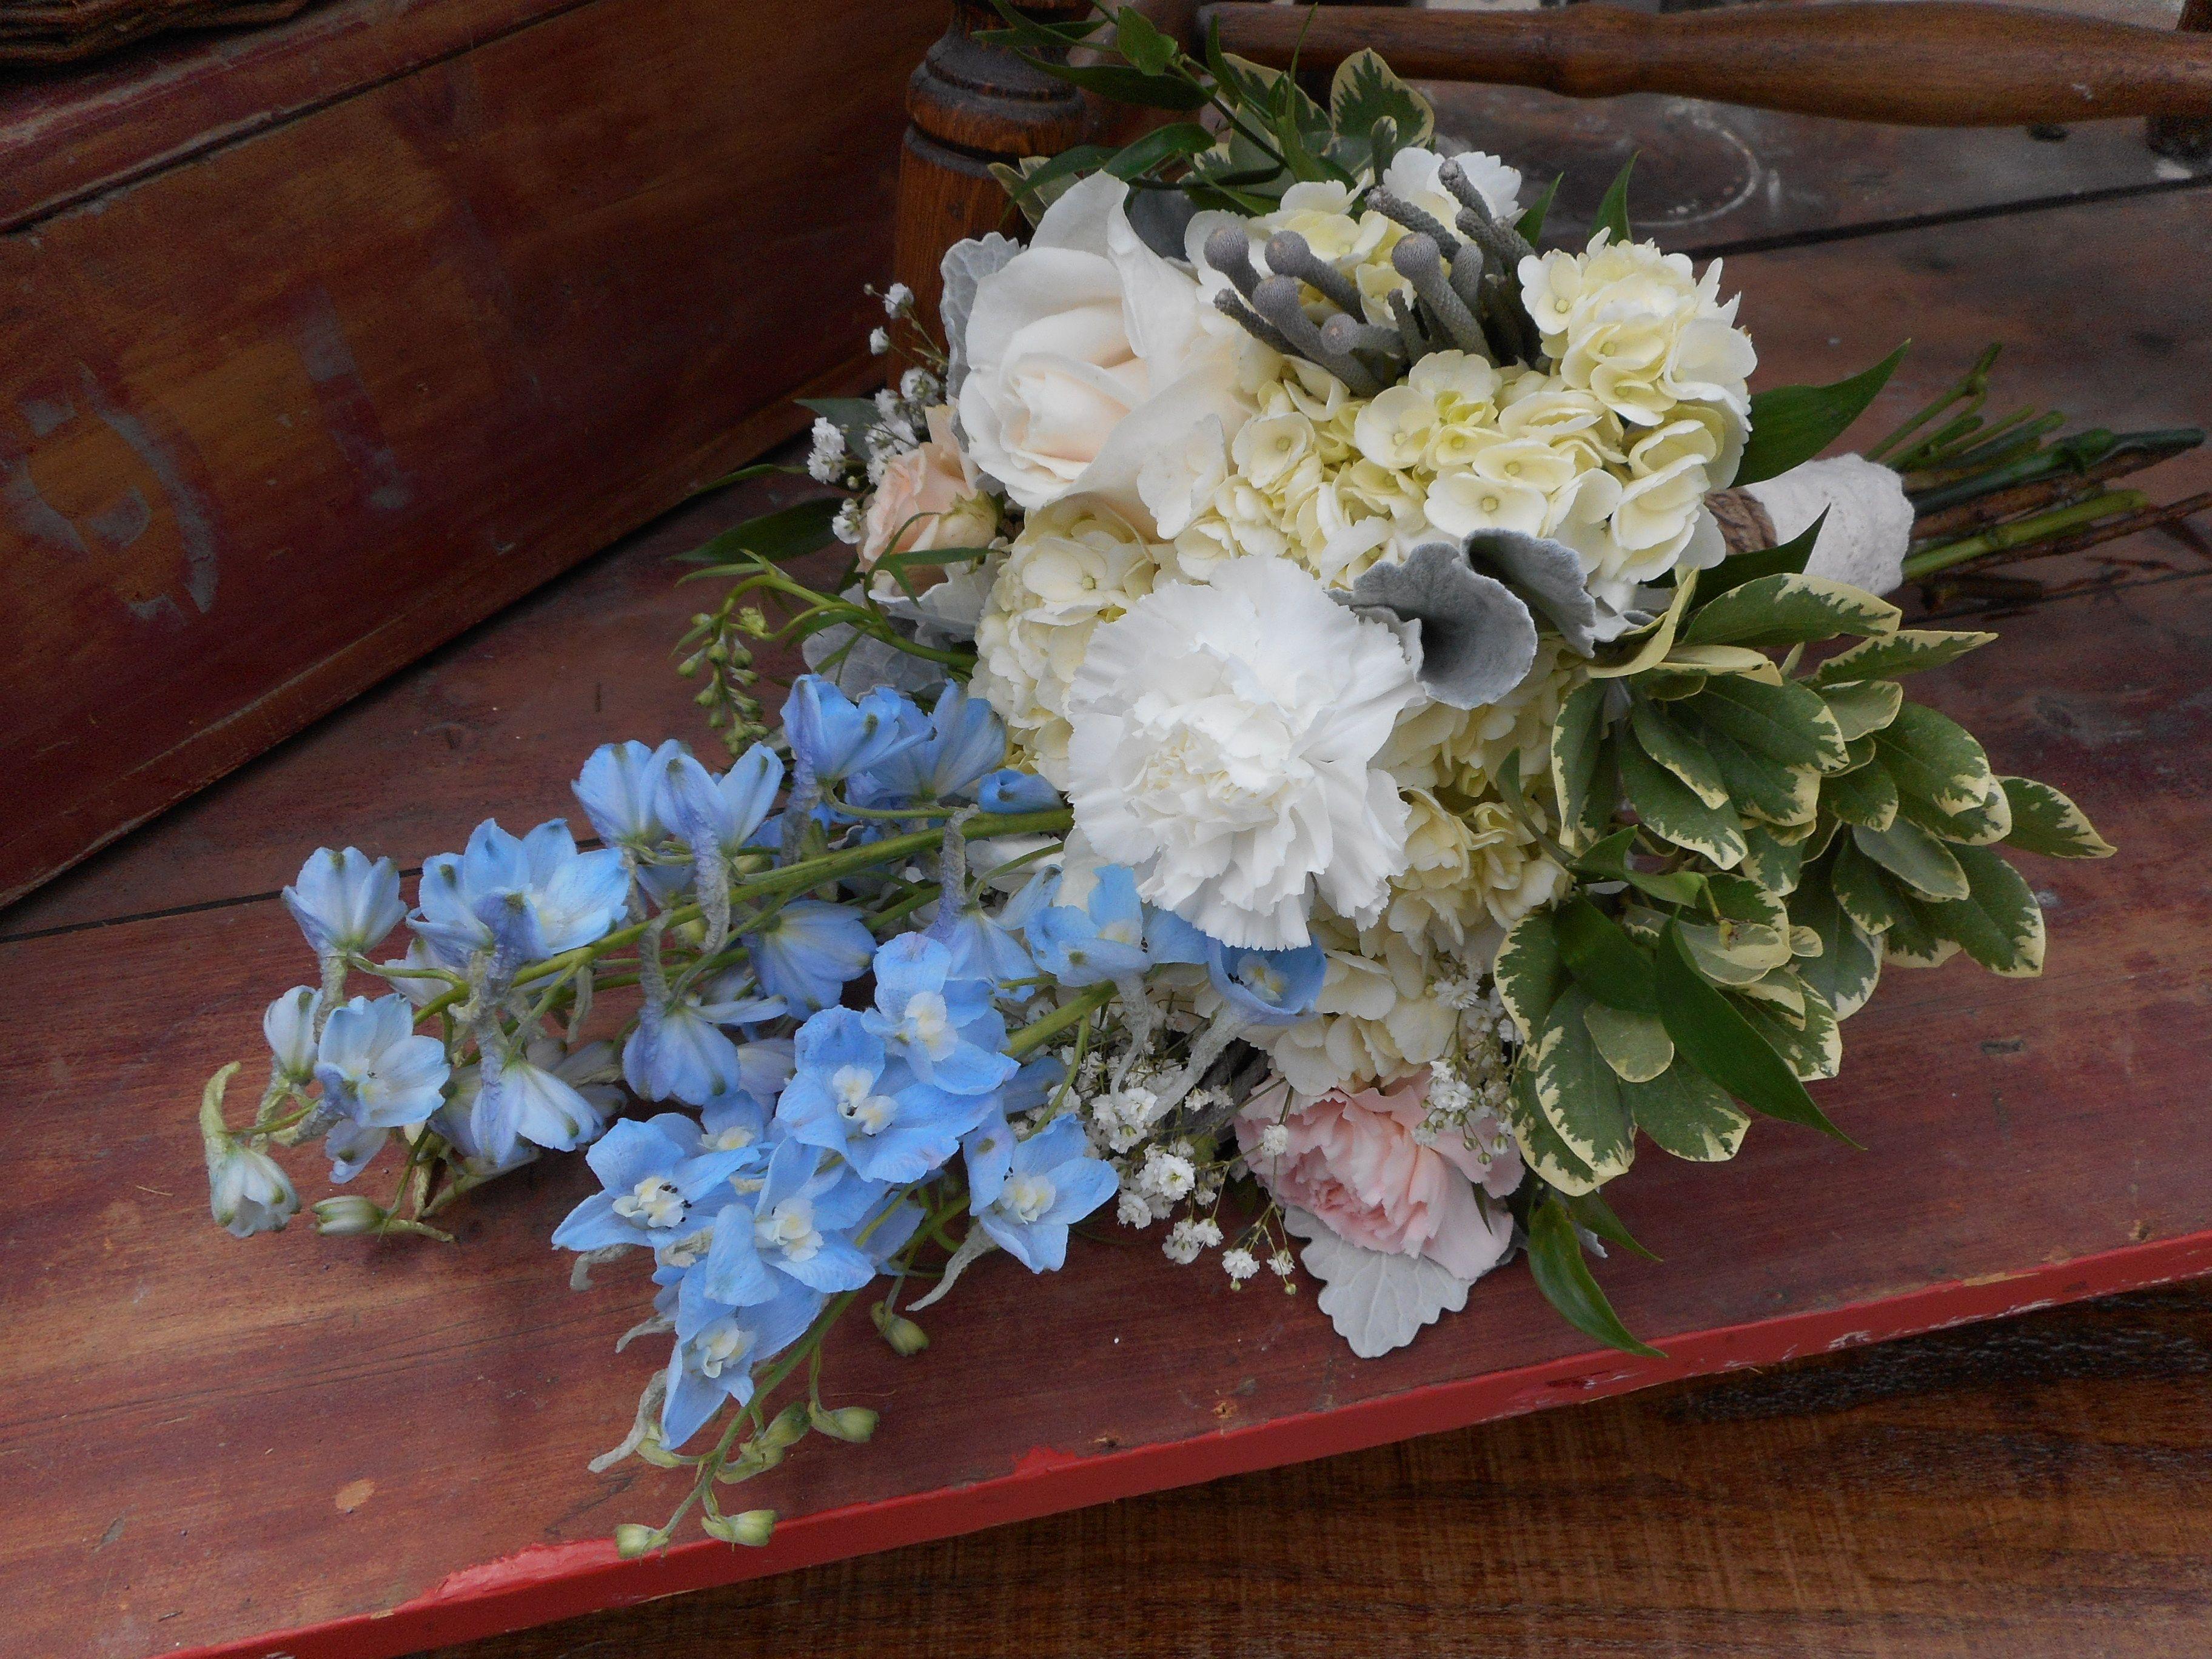 Blue and white Bridal Bouquet. #weddingflowers #orangevilleflorist #blueandwhite #delphinium #hydrangea